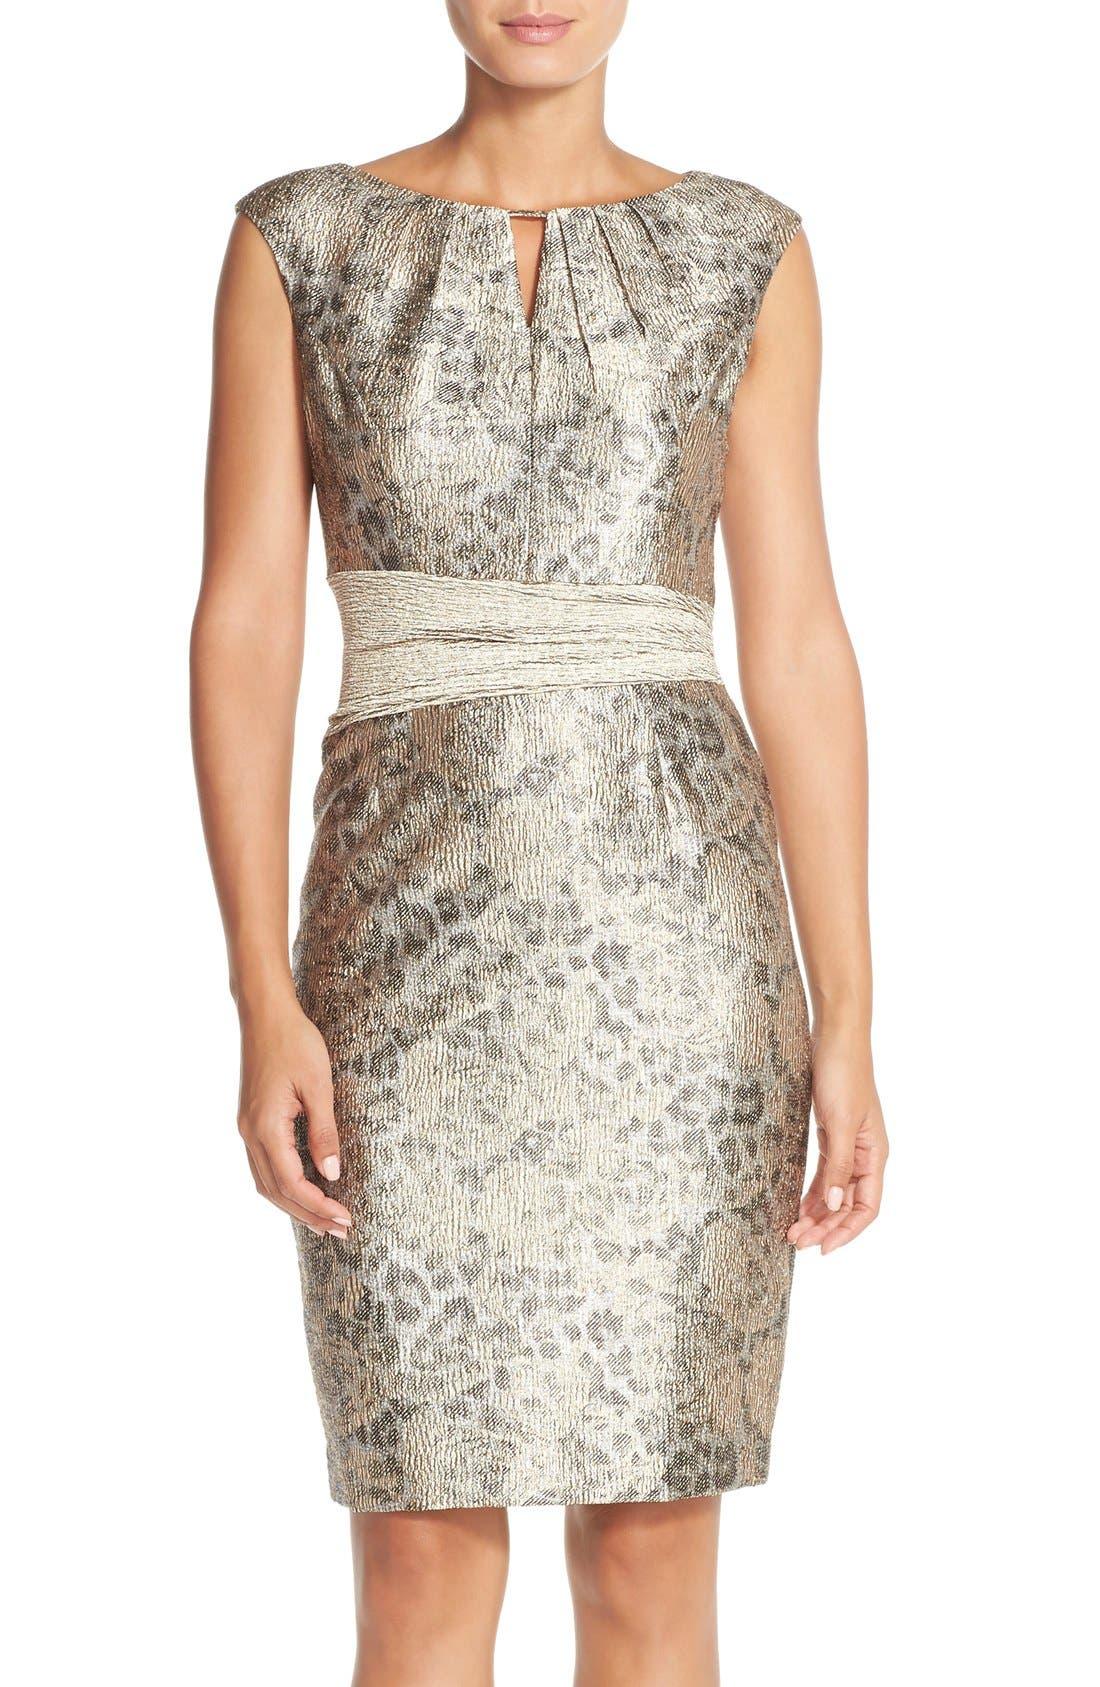 Alternate Image 1 Selected - Ellen Tracy Metallic Jacquard Sheath Dress (Regular & Petite)